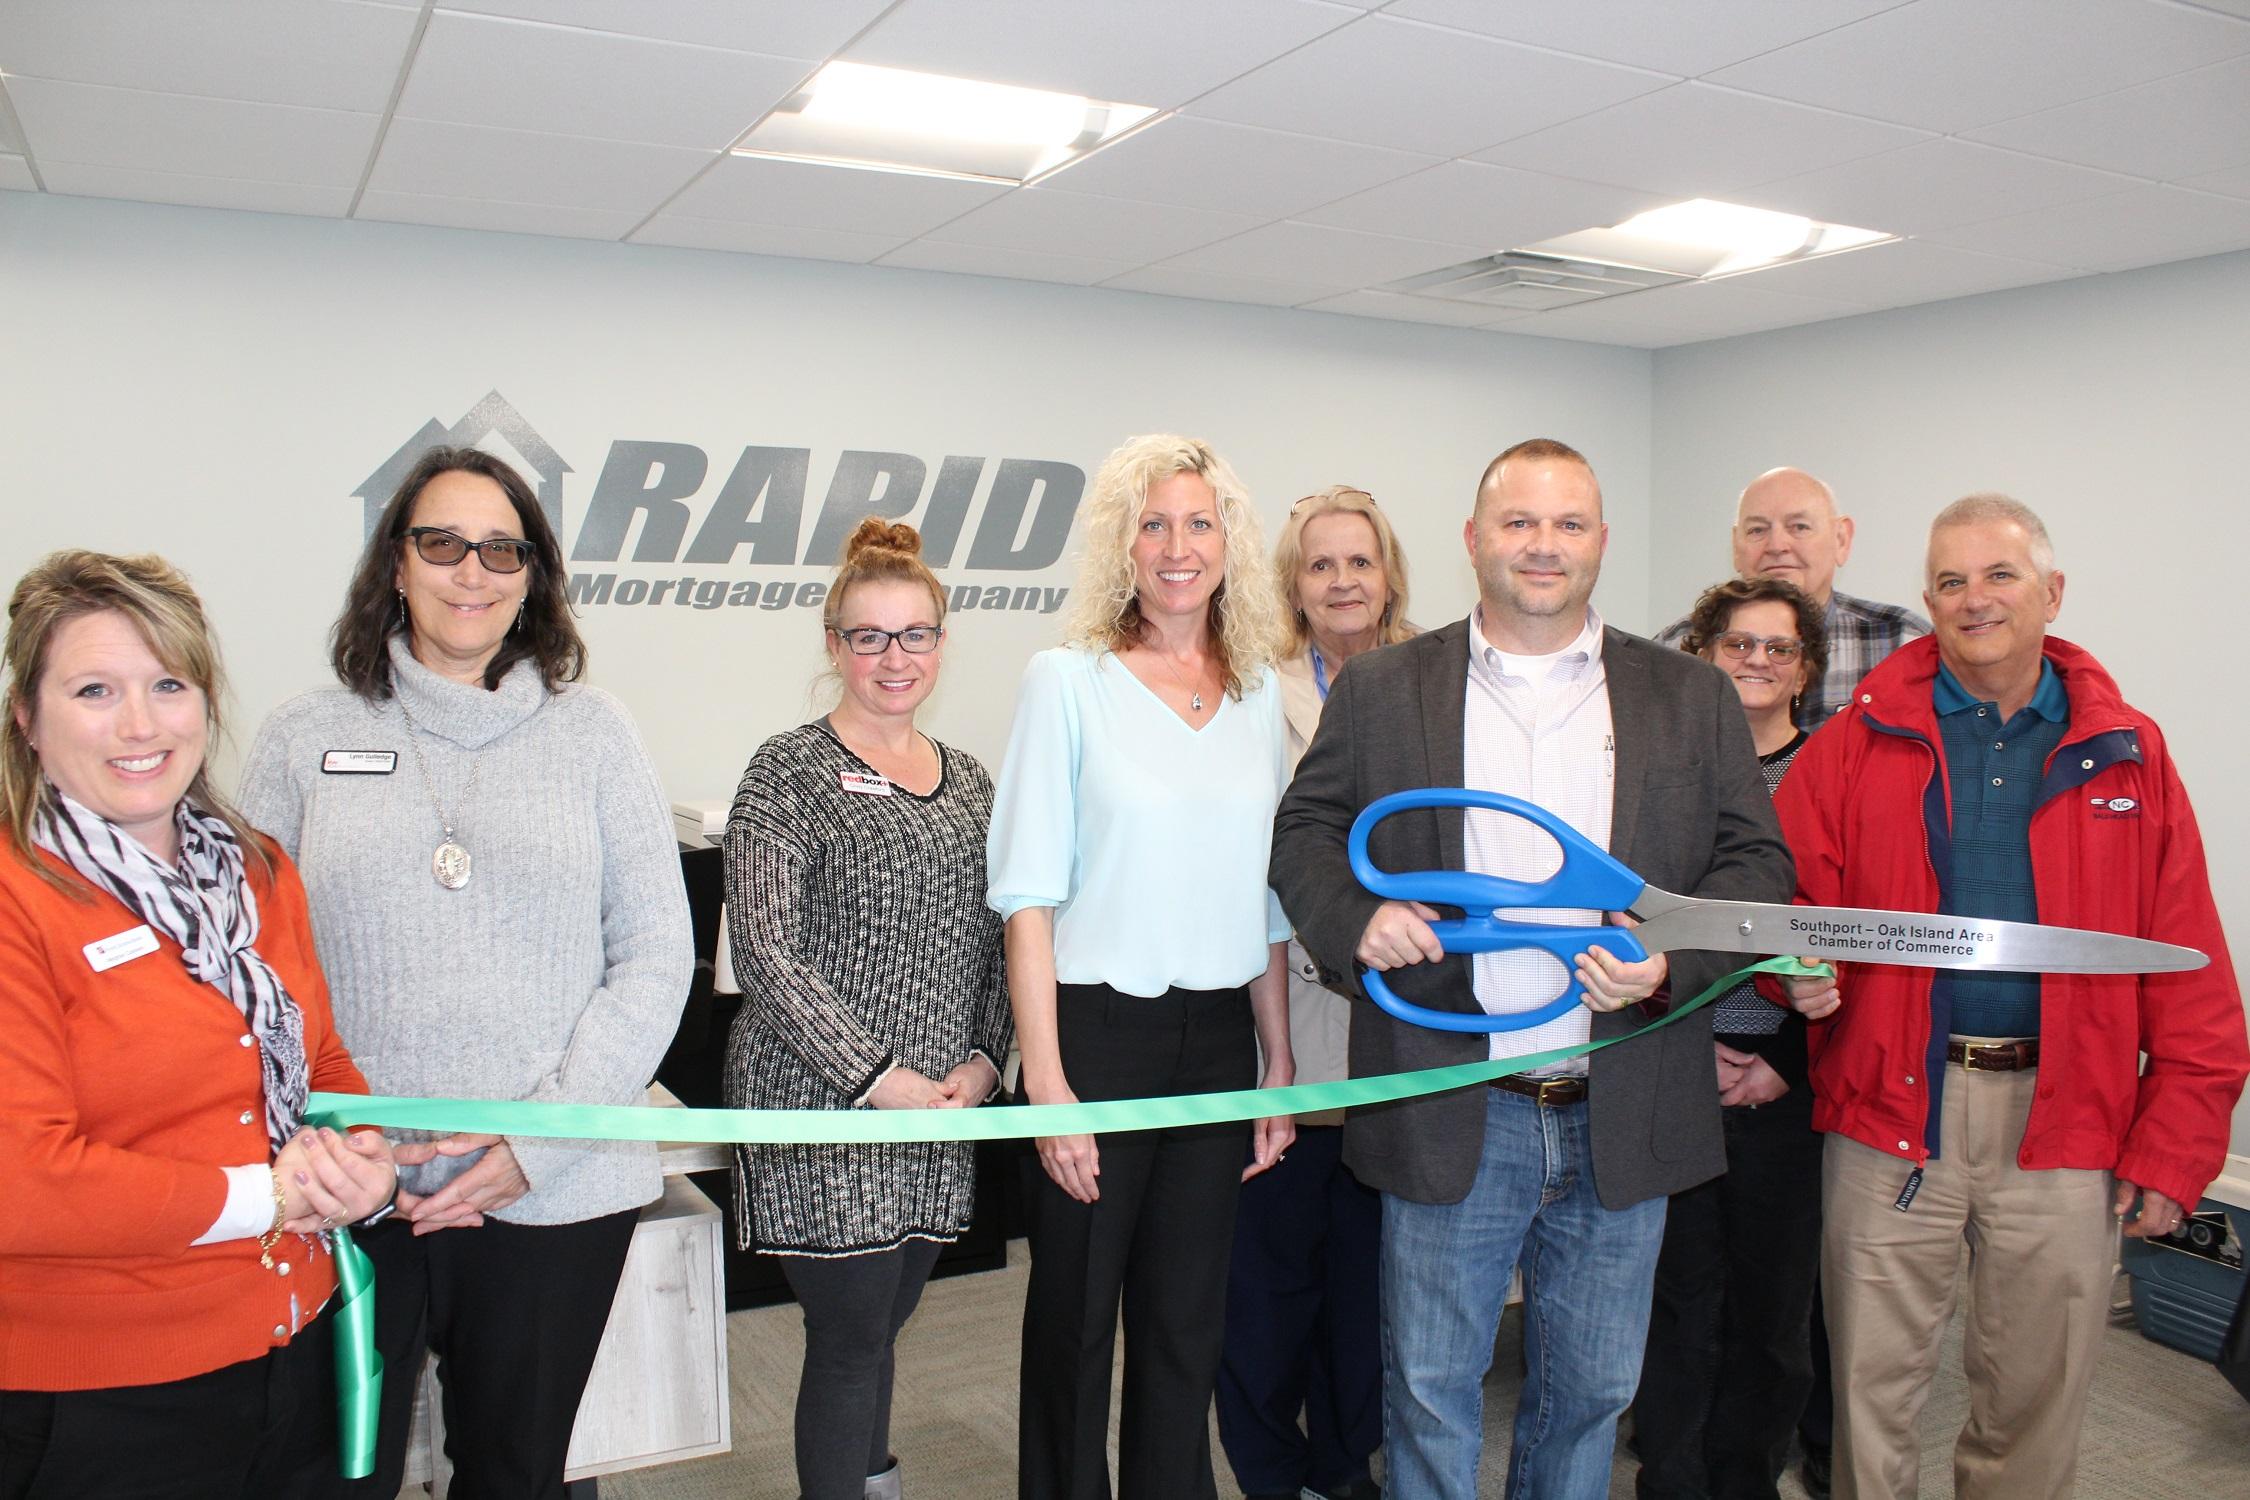 Rapid Mortgage Opens on Oak Island